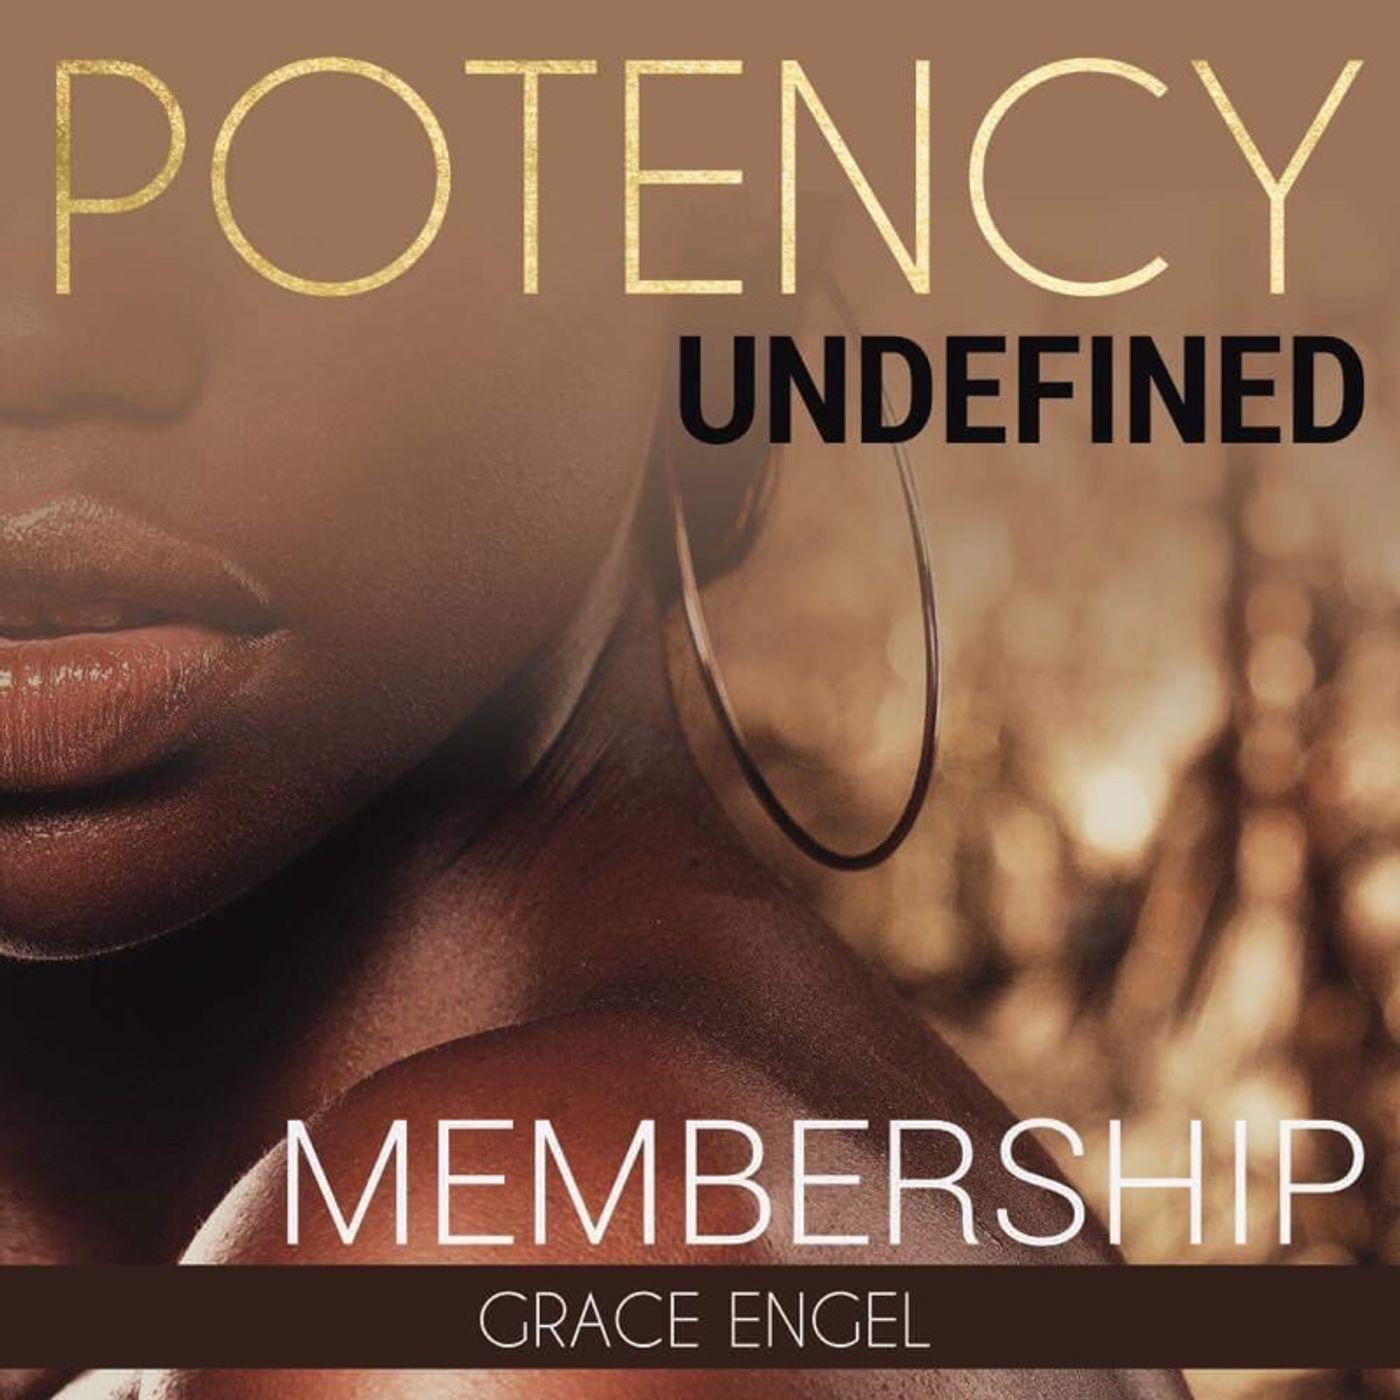 Episode 19 - Potency Undefined